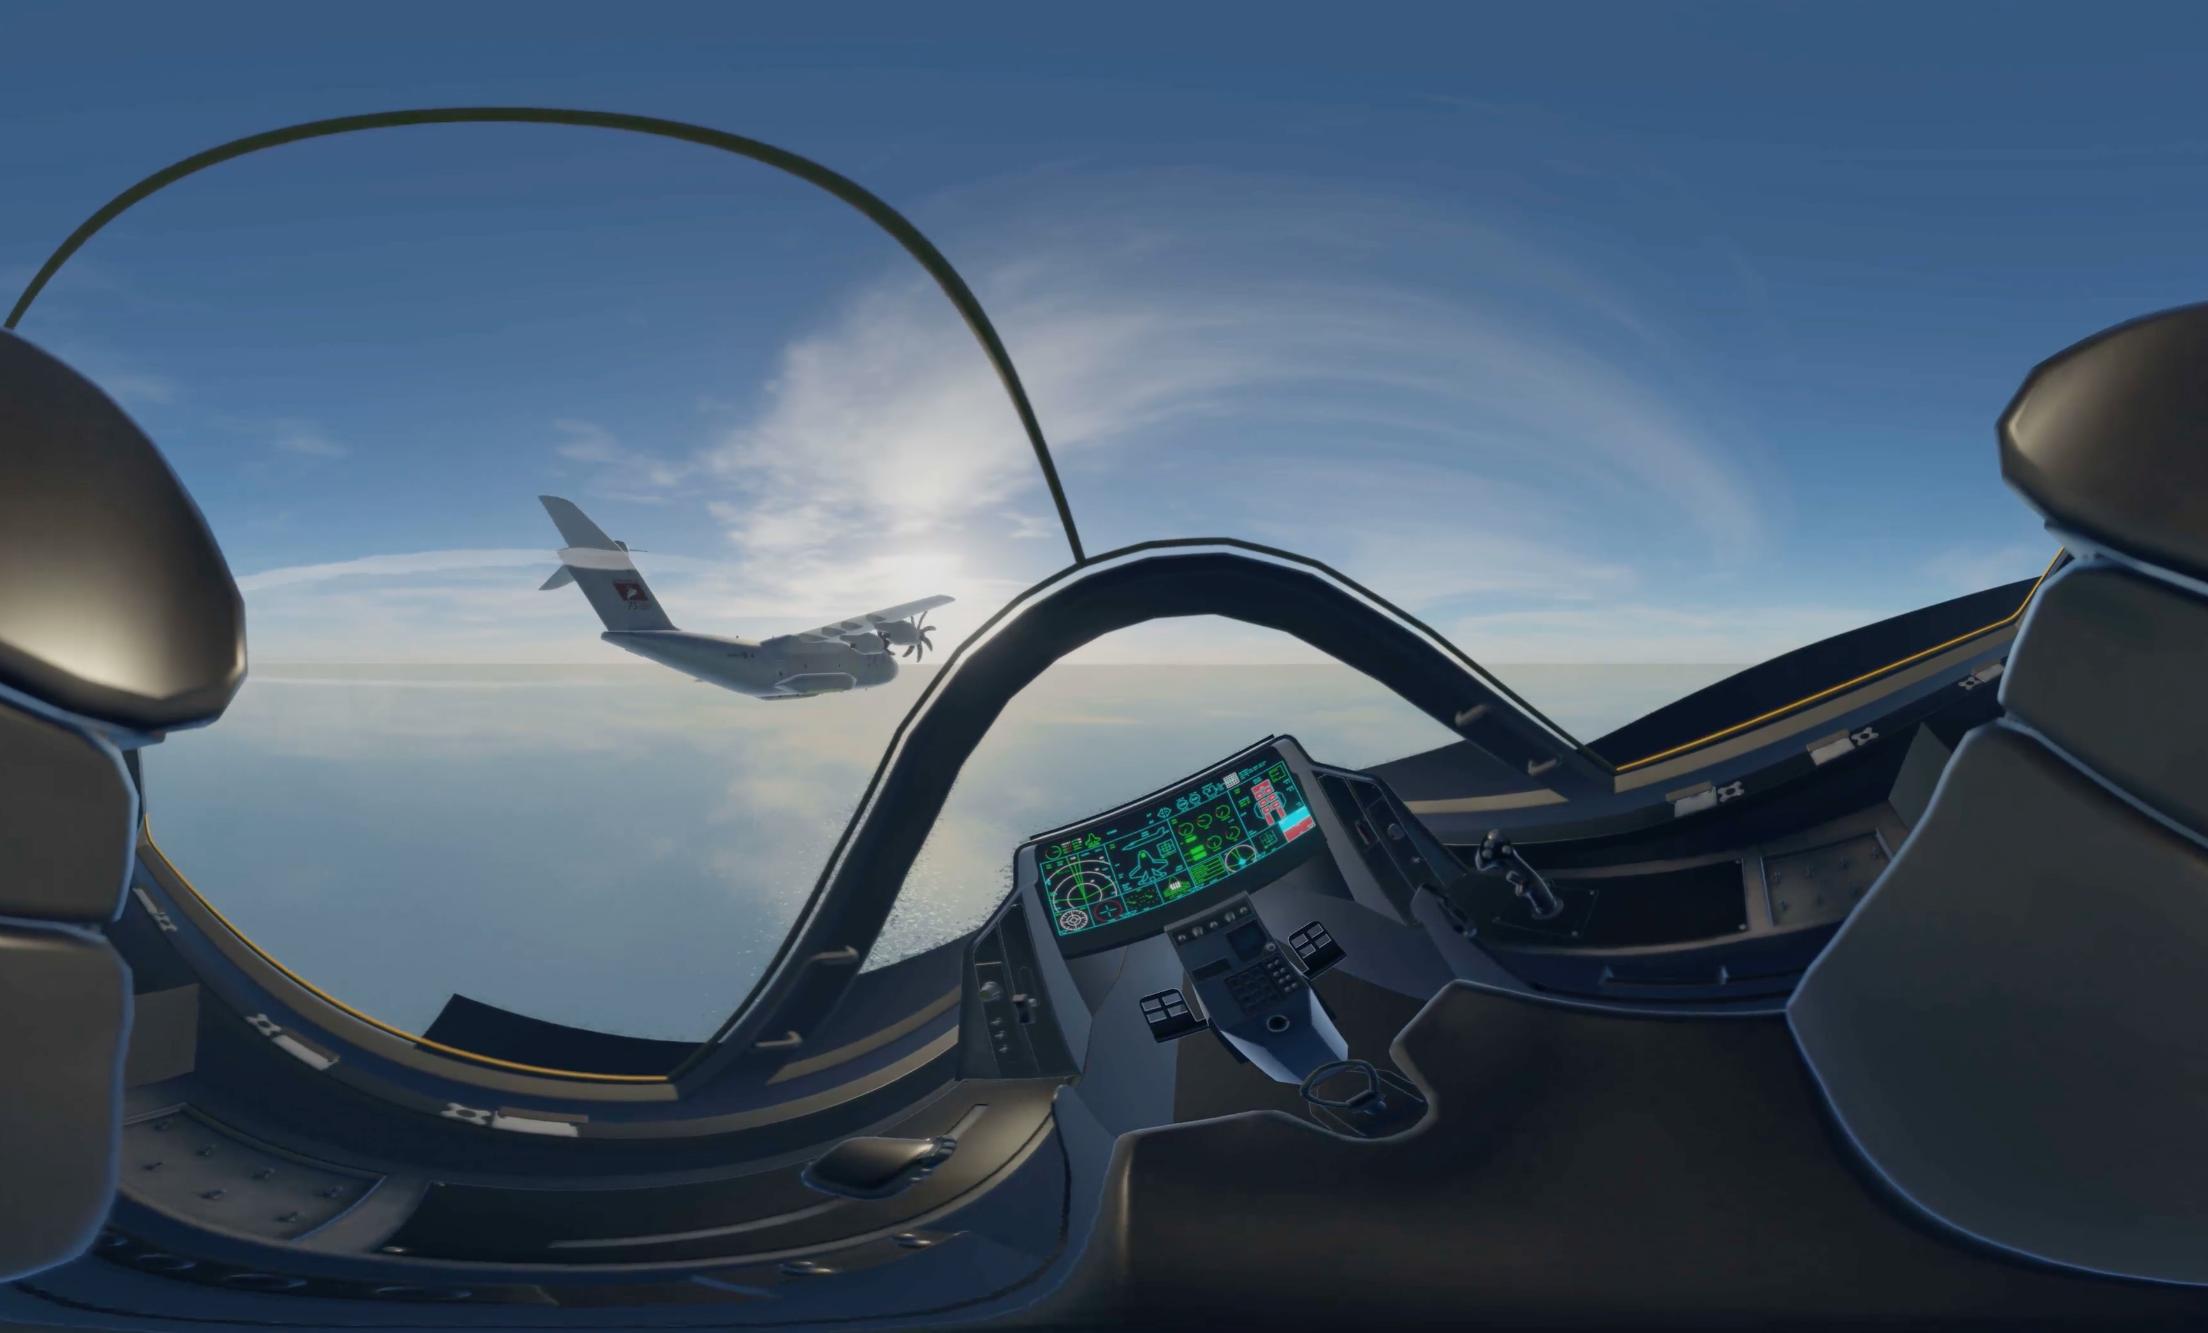 RAF VR EXPERIENCE